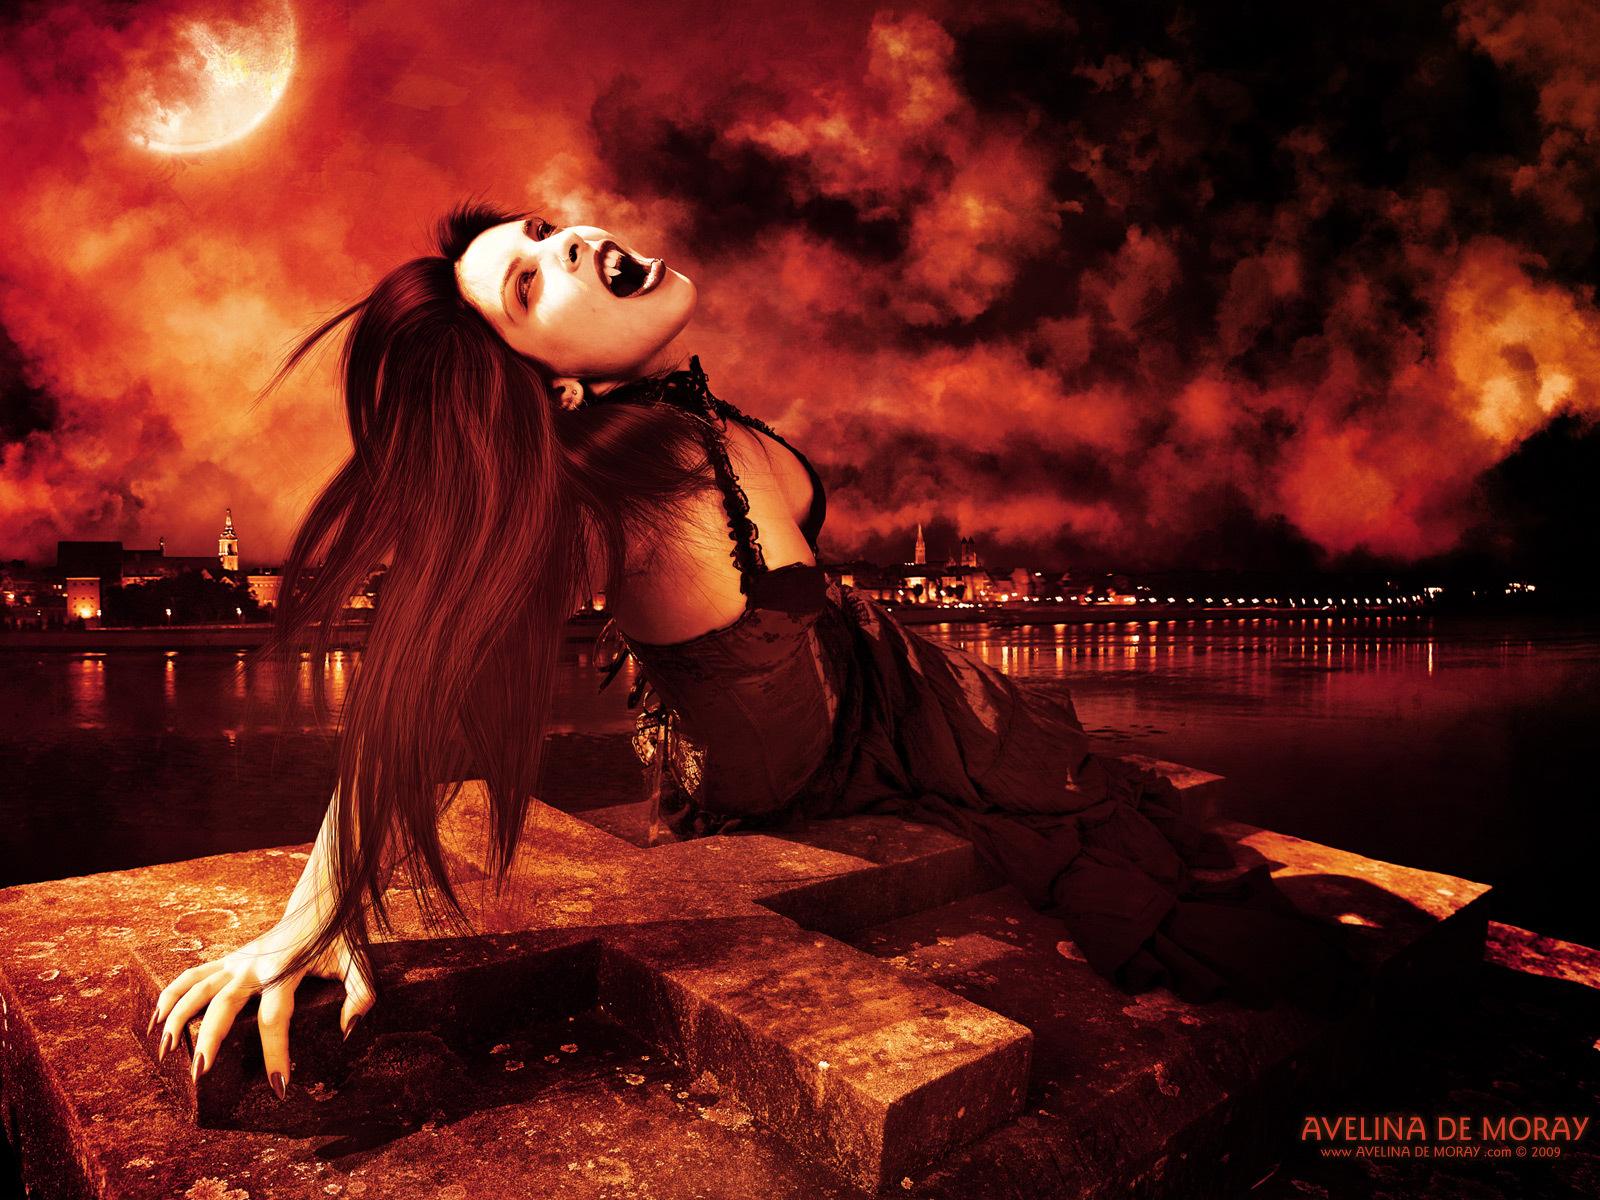 Vampires Images Vampire Art Wallpapers By Artist Avelina De Moray HD 1600x1200